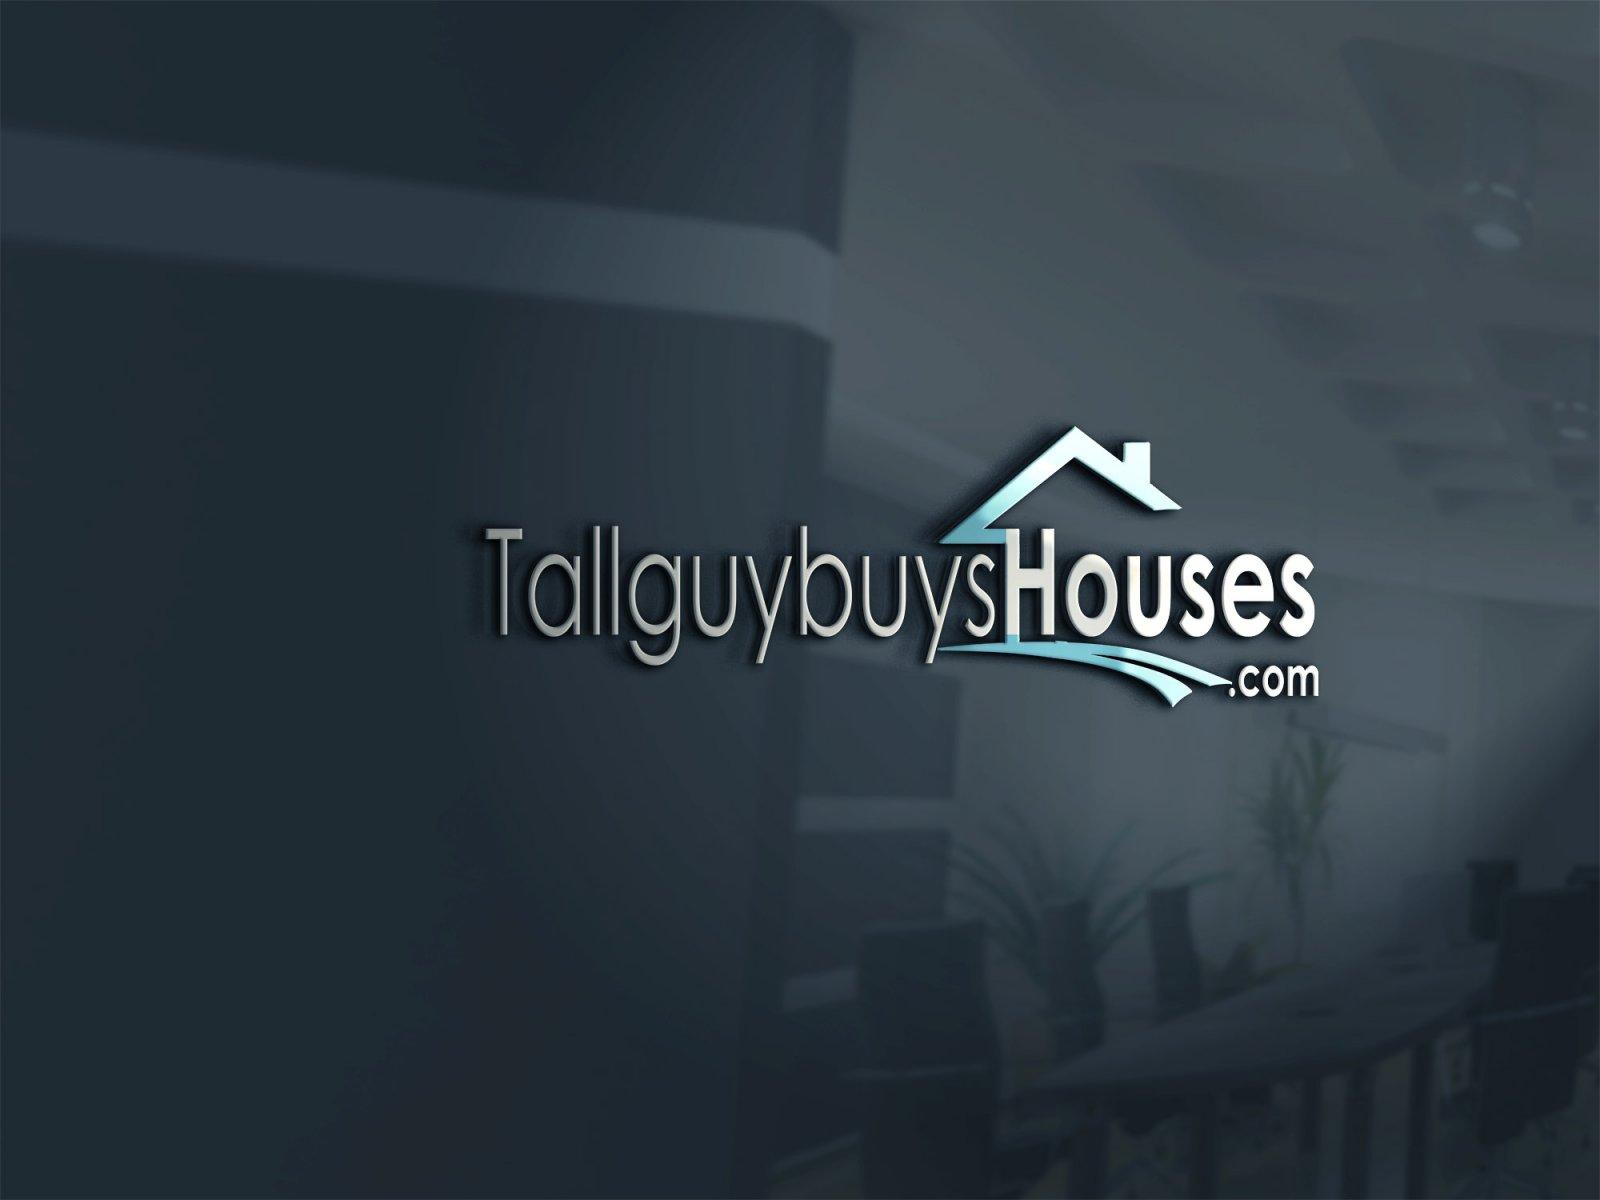 www.TallGuyBuysHouses.com  logo